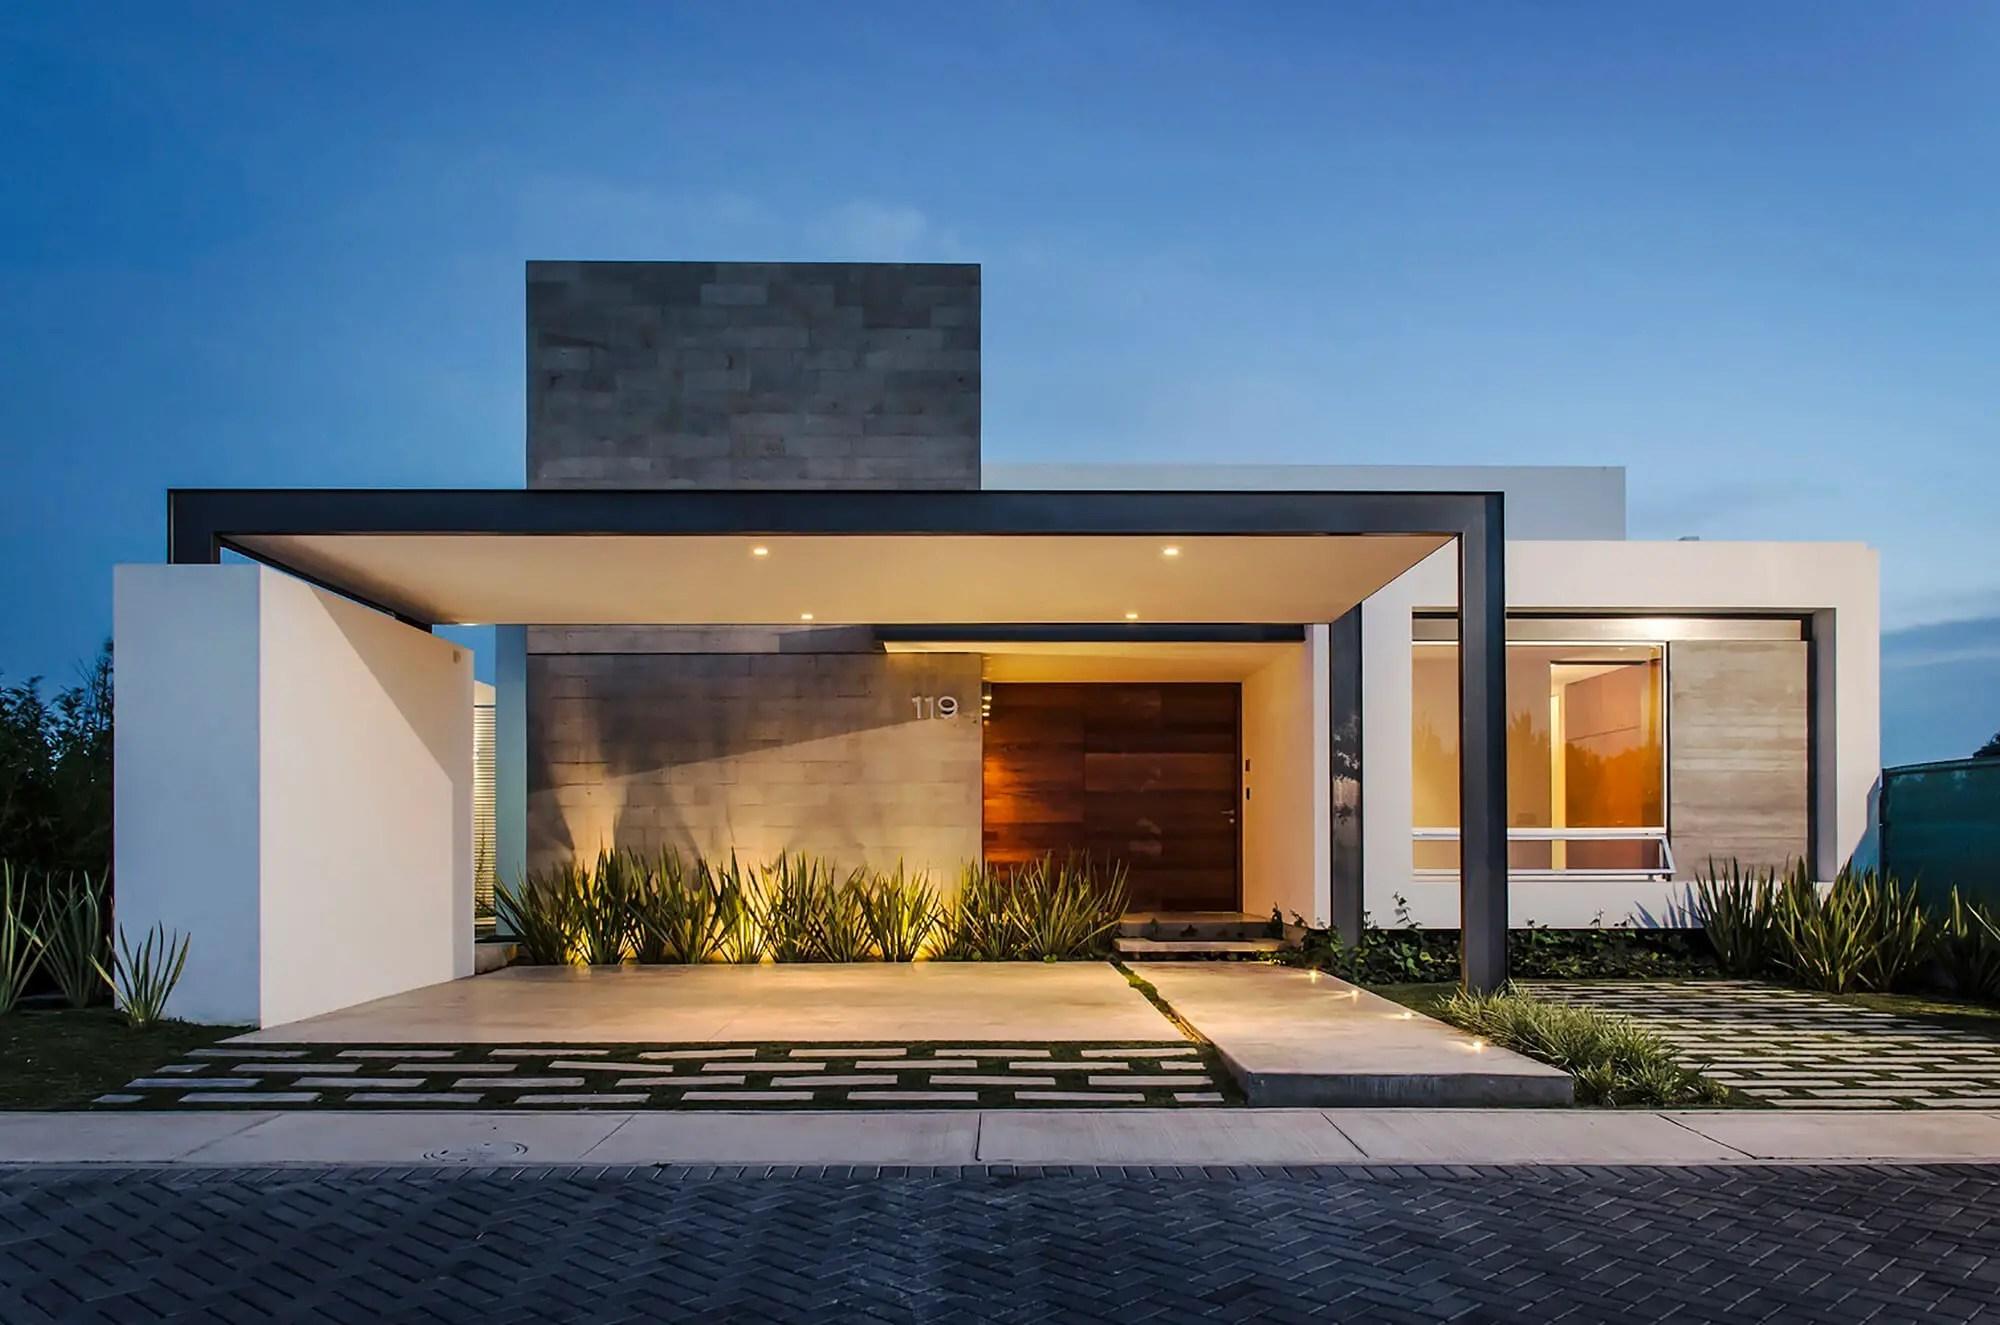 10 Modern One Story House Design Ideas